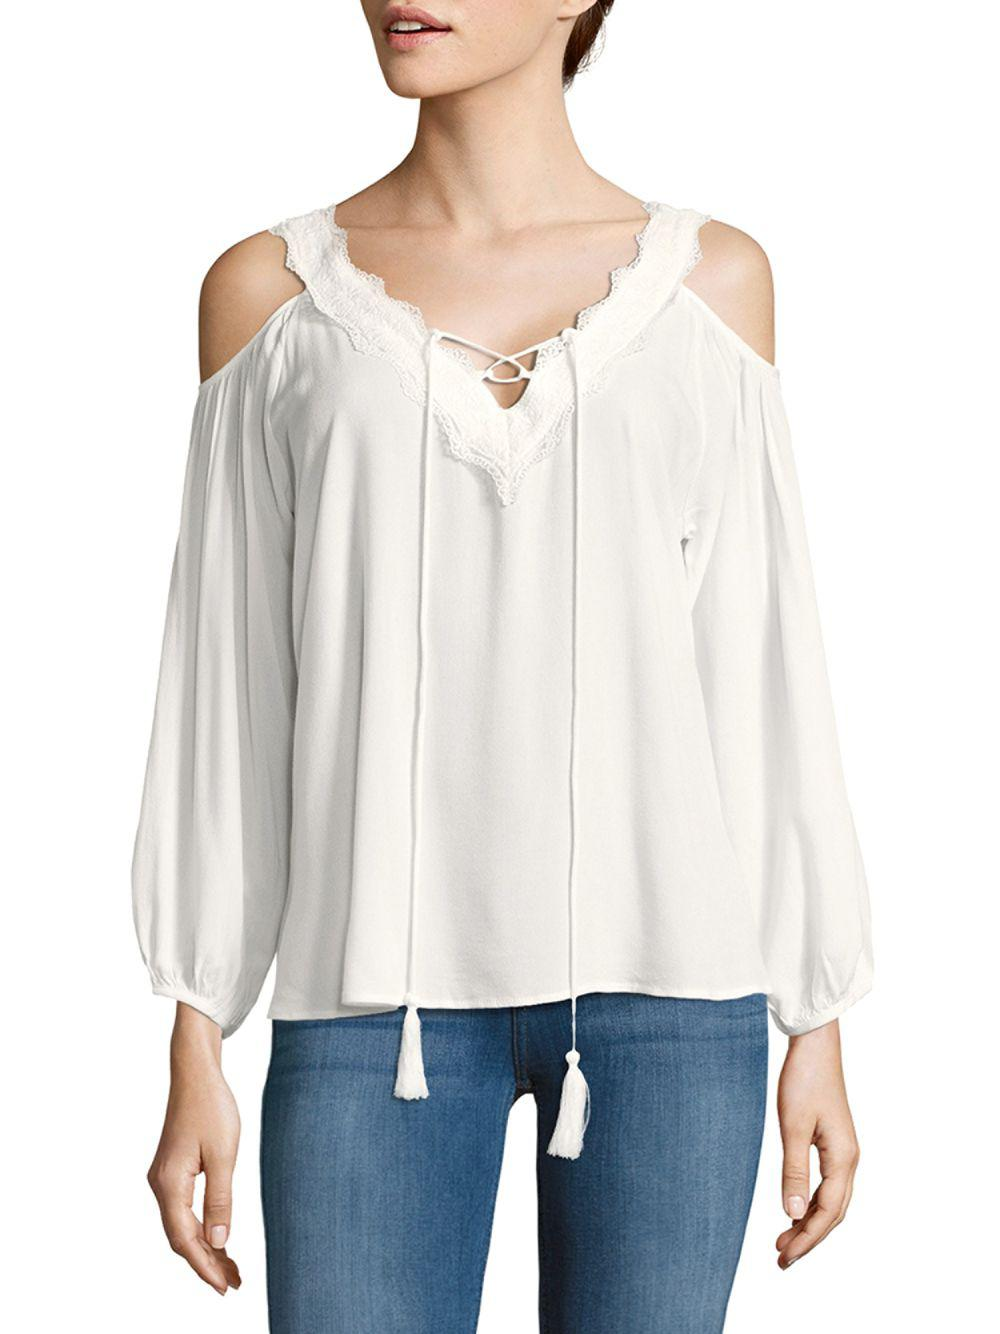 1aea1a351efaf Lyst - Cirana Cold-shoulder Crisscross Top in White